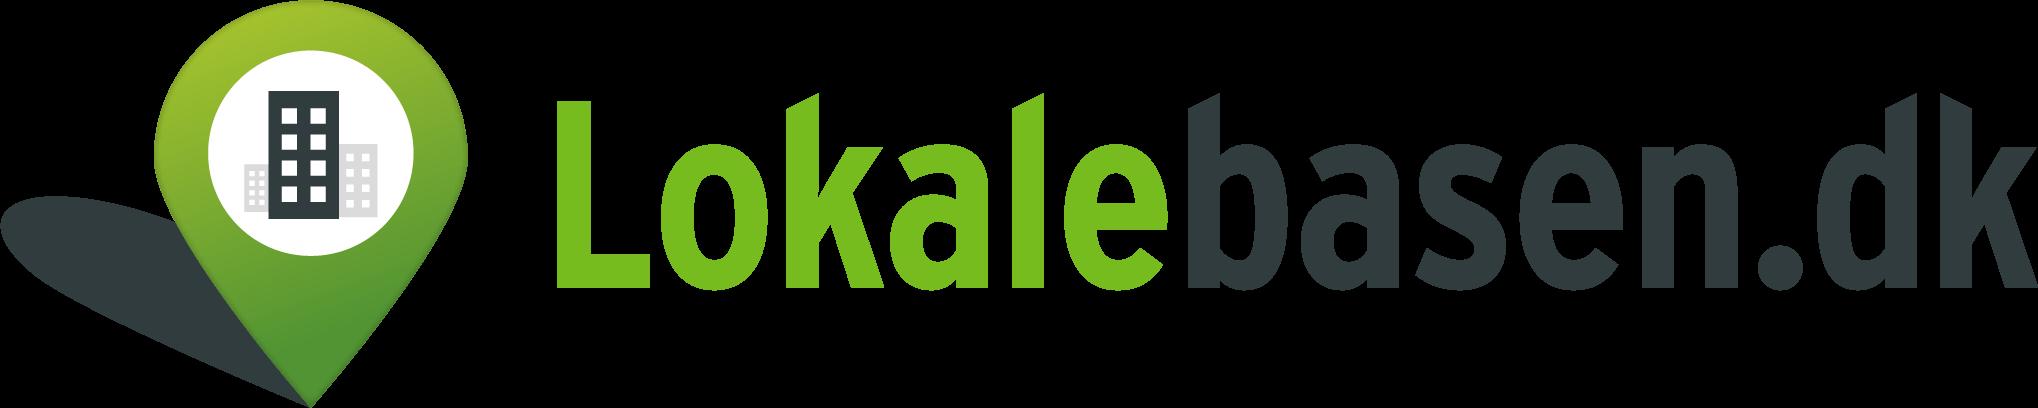 lokalebasen_logo2x